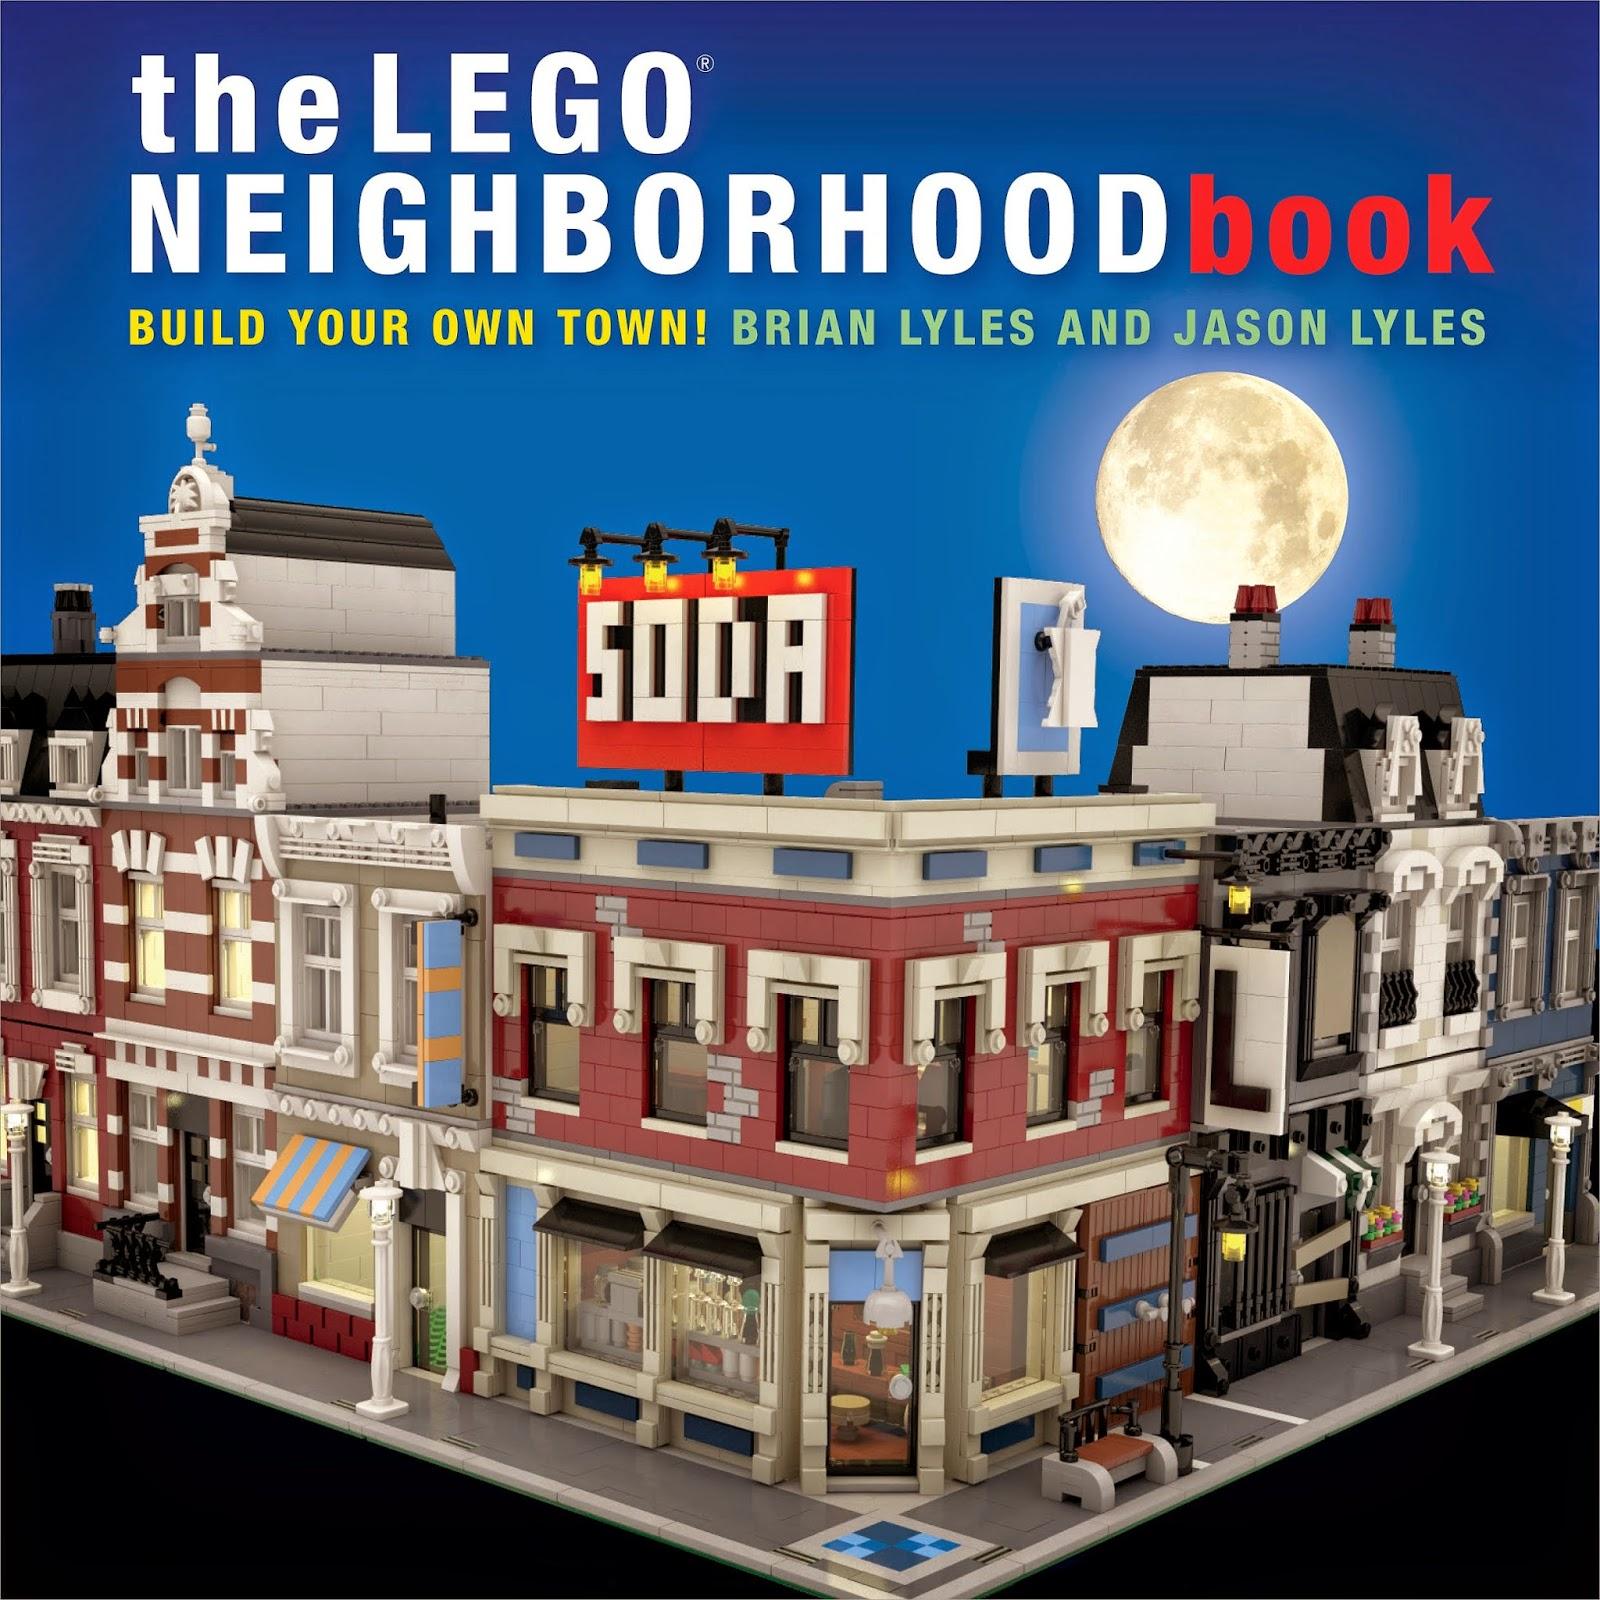 The Lego Neighborhood Book Review